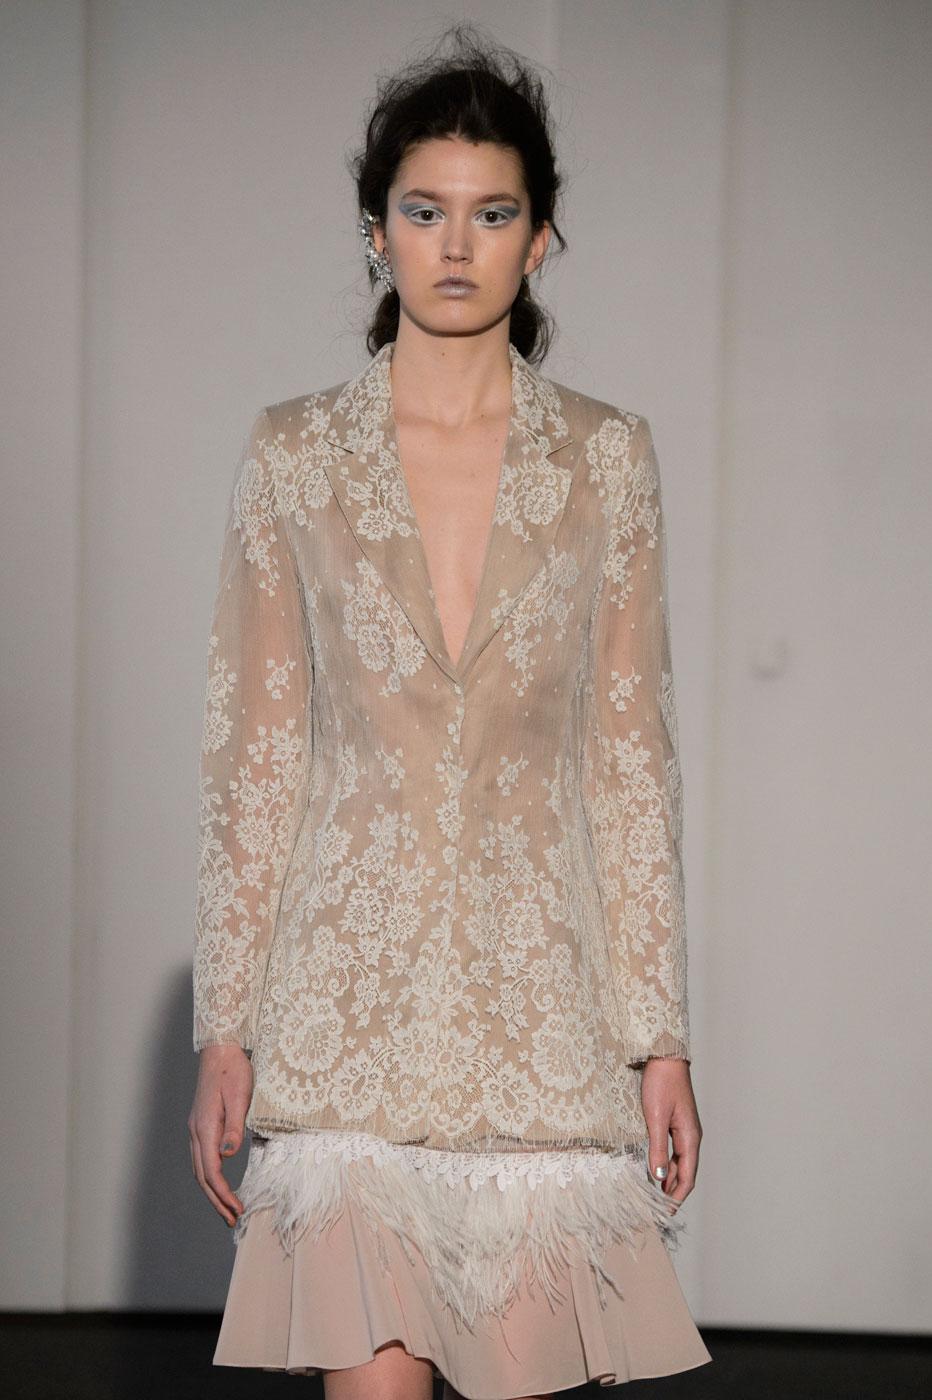 Busardi-fashion-runway-show-haute-couture-paris-spring-2015-the-impression-05